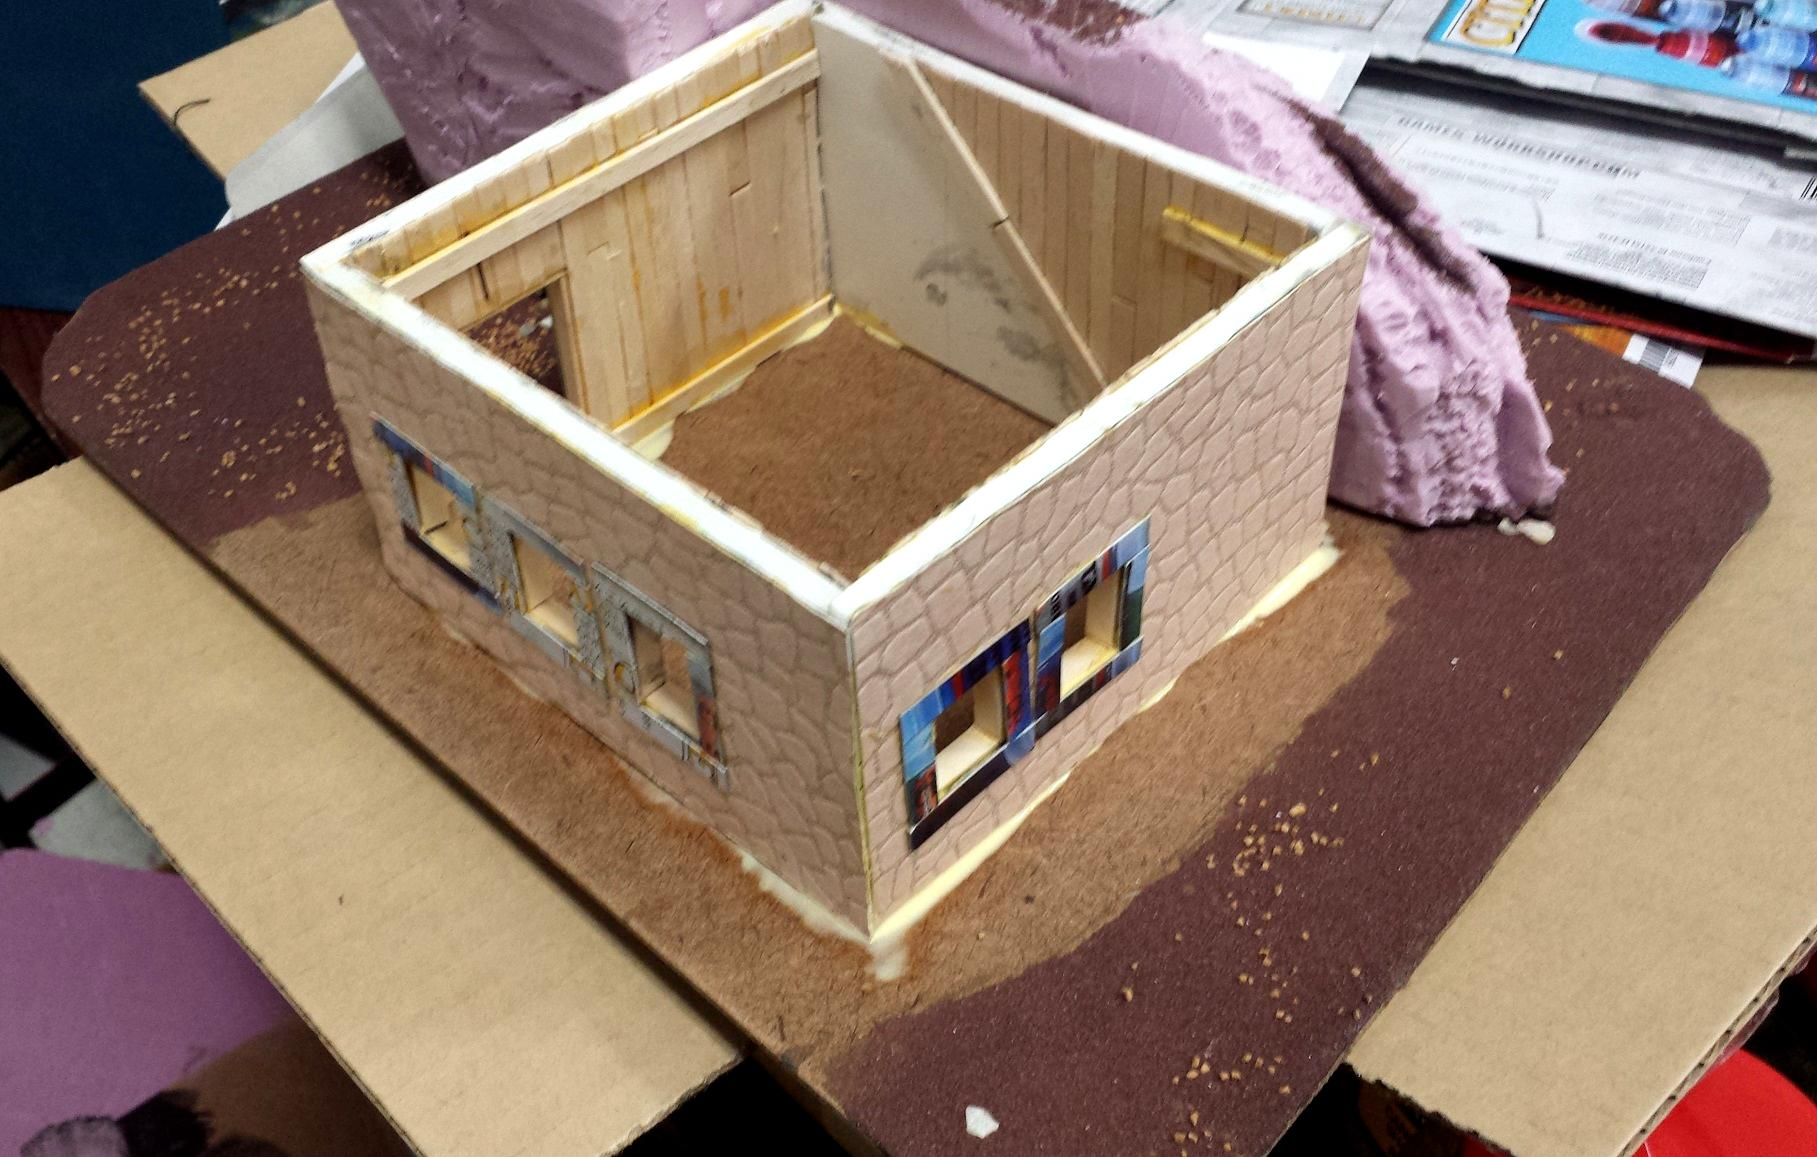 Blue, Commission, Hot Glue, Hotglue, Mesa, Pink, Styrofoam, Terrain, Tutorial, Waaazag, Waazag, Walls, Work In Progress